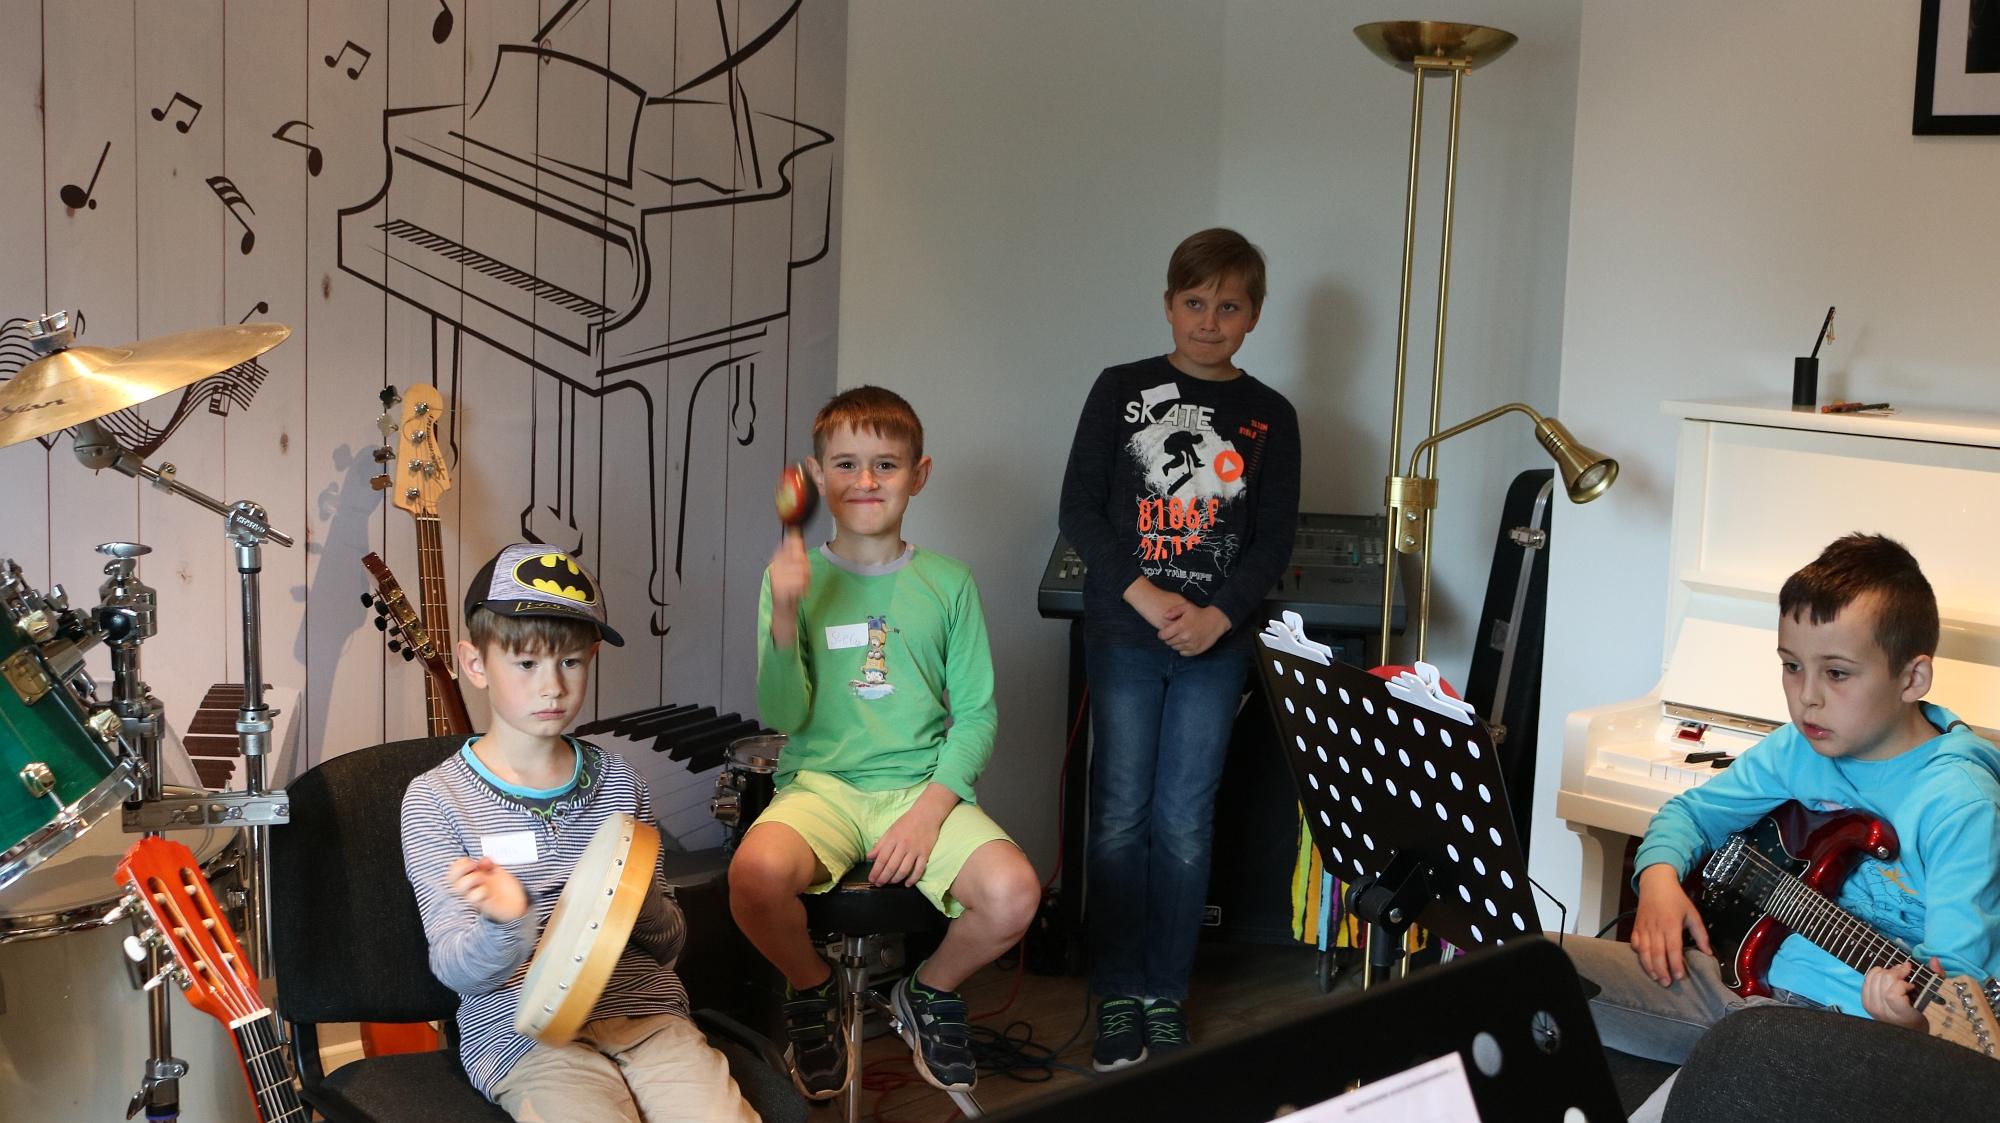 202007 Bandprobe FP Musikschule Harmonie 10